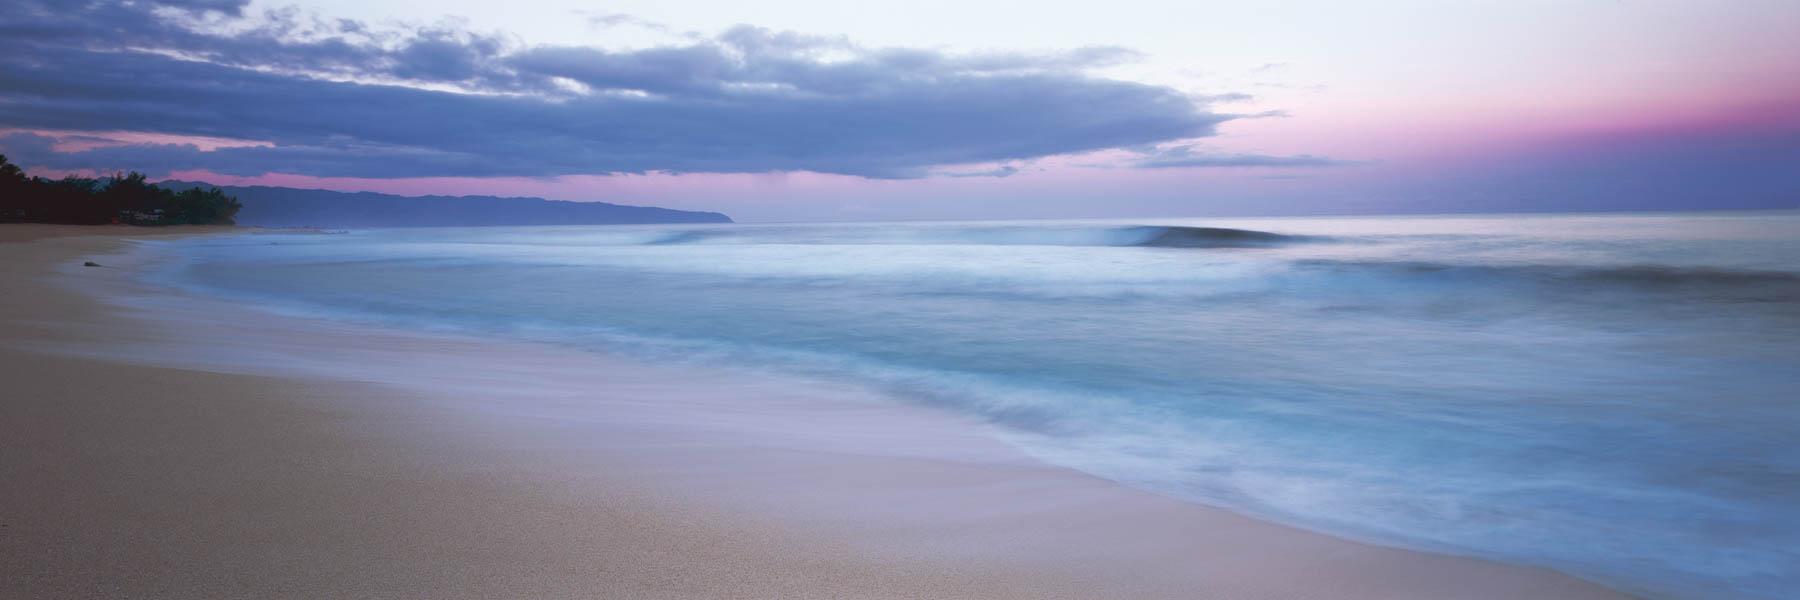 A pastel sunset over Oahu Beach, Hawaii, USA.